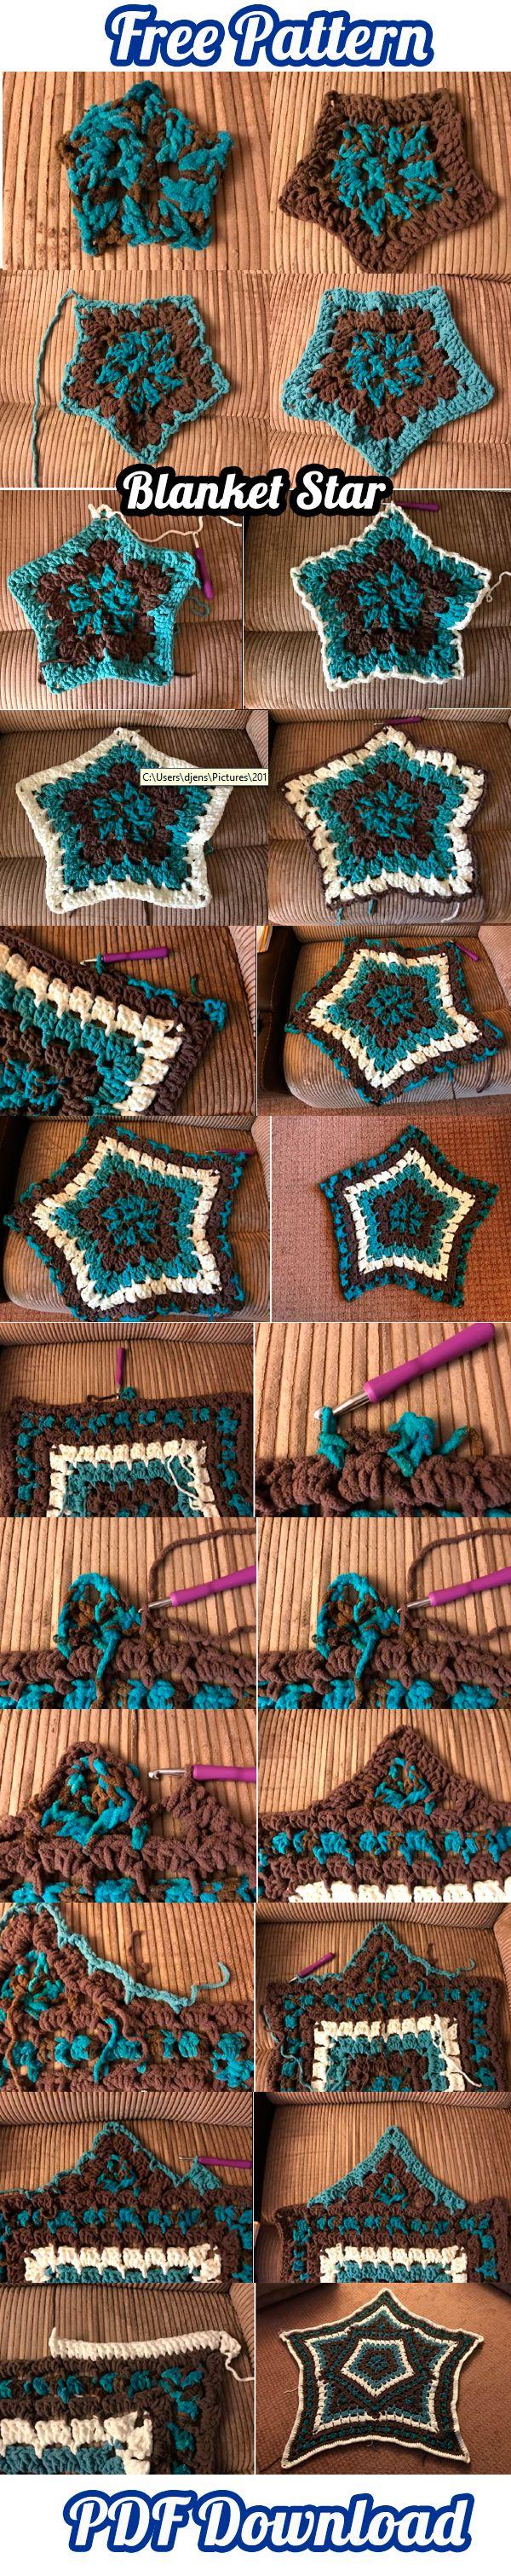 Star Kaleidoscope Afghan | Blanket Pattern PDF Download | Ravelry, Free Patterns, Crochet Patterns, Blanket Patterns, Blanket Afghan, Blanket Star, Crochet Afghan, DIY, Crafts, Handmade, How To, ravelry.com